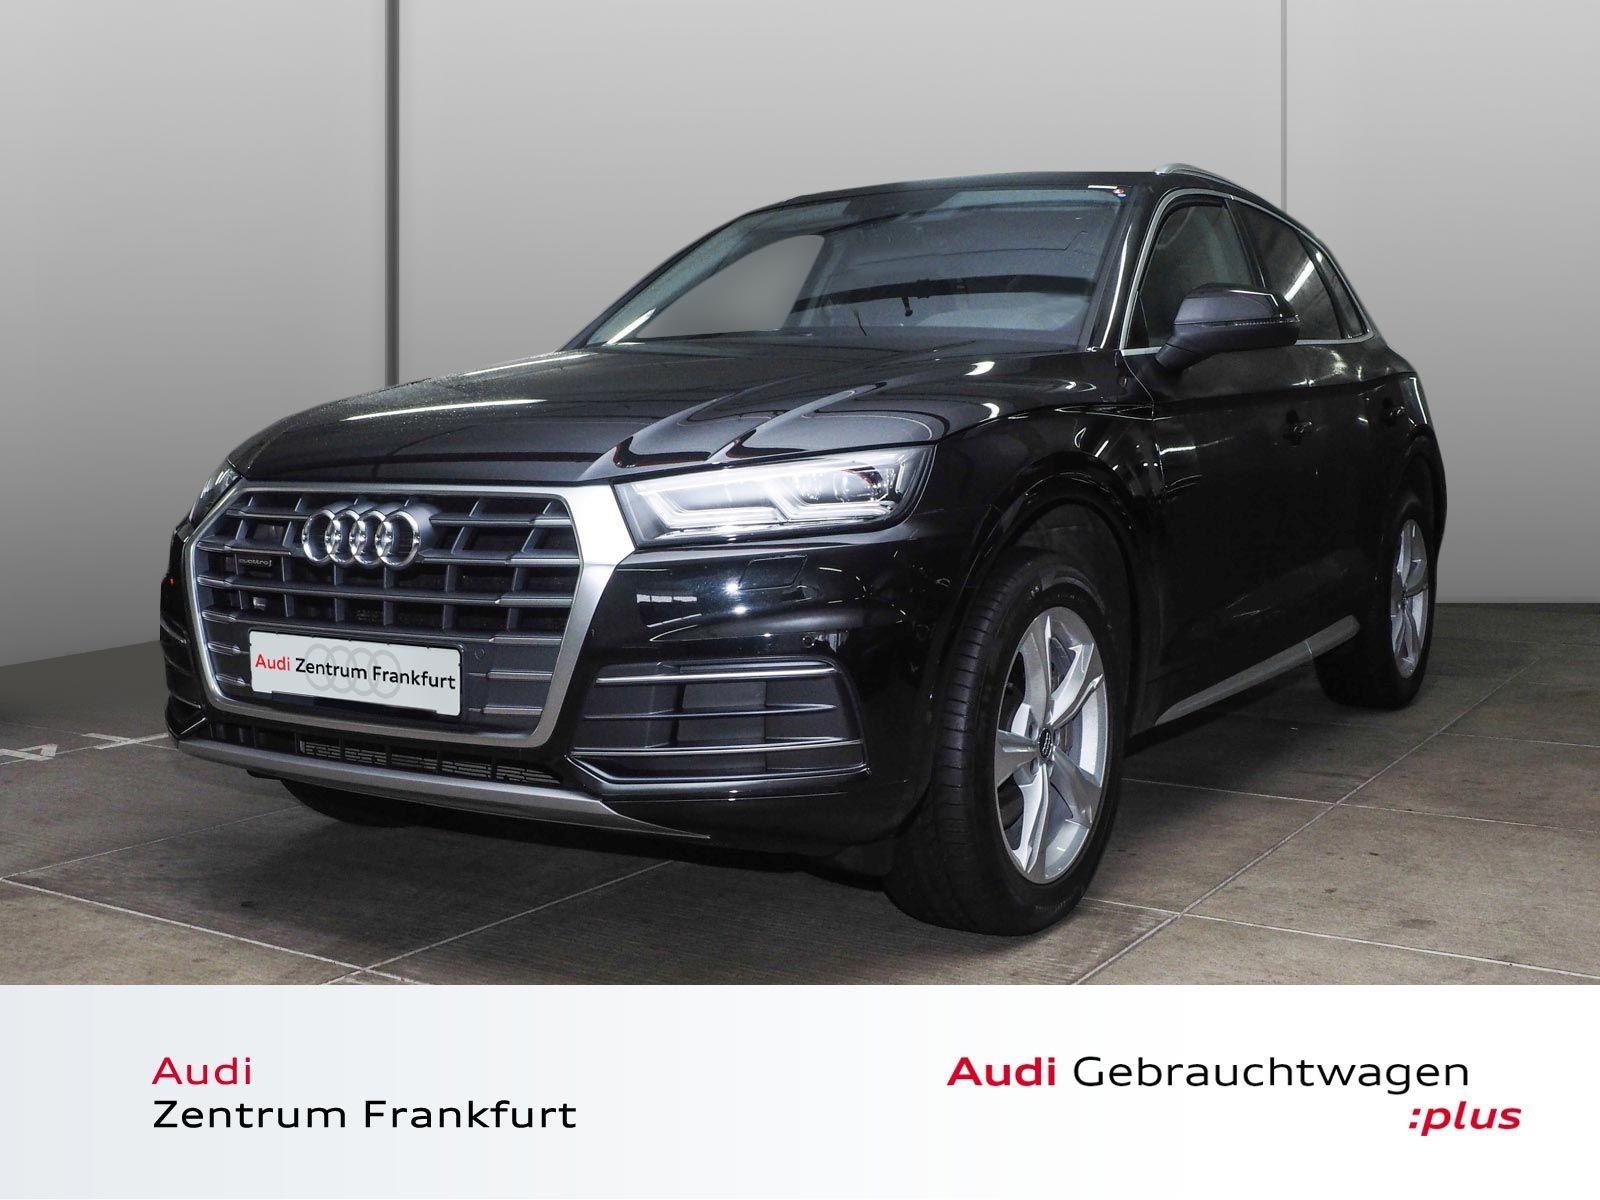 "Audi Q5 2.0 TDI quattro sport S tronic Navi Alu19"" LED AHK VirtualCockpit, Jahr 2017, diesel"